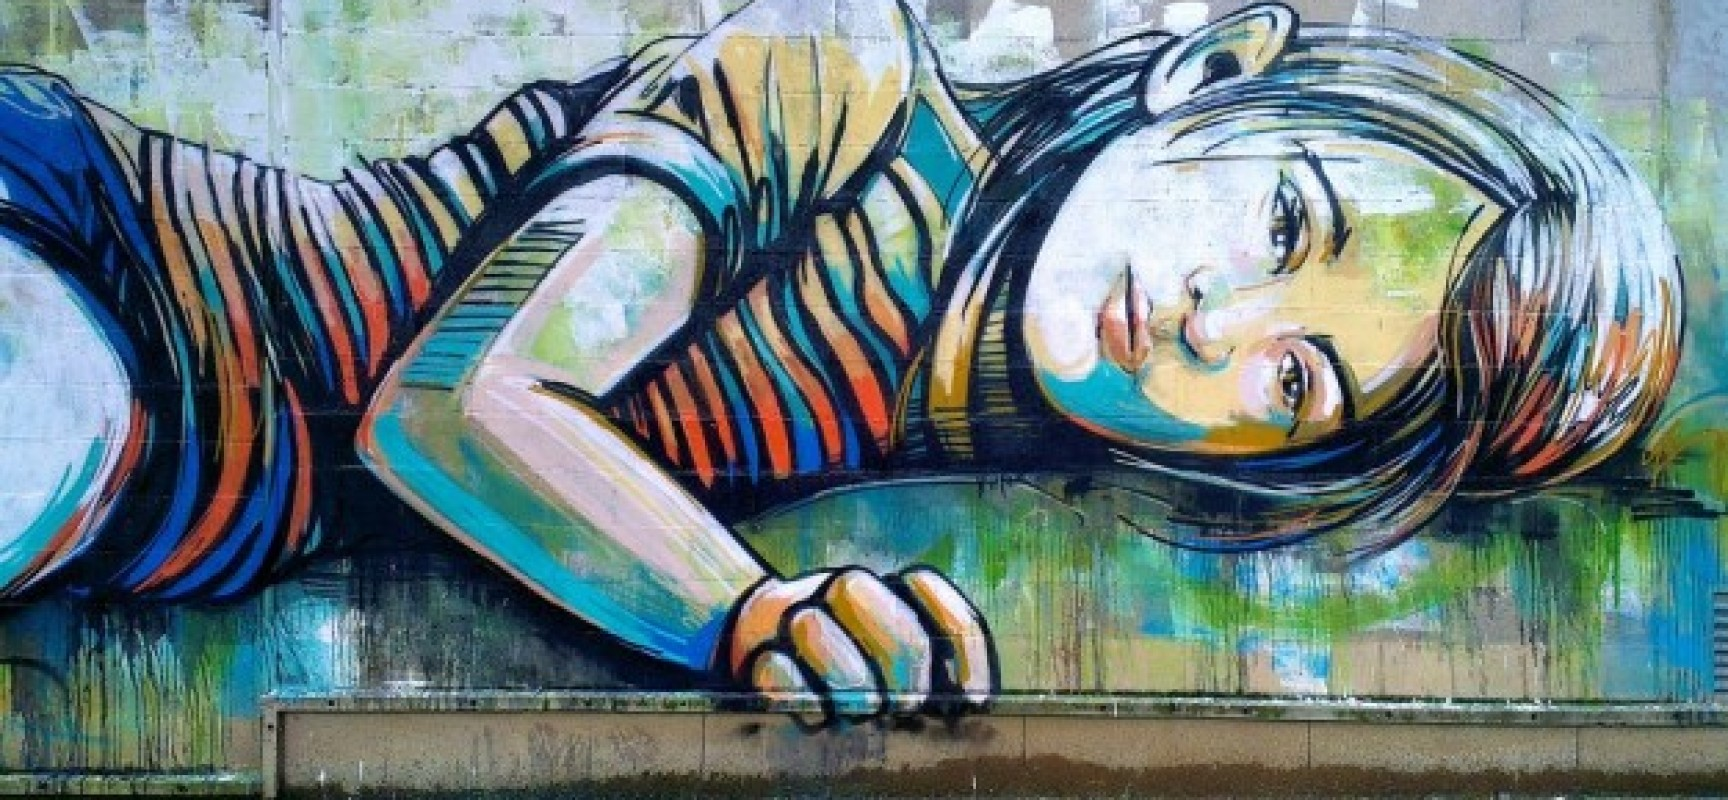 Image gallery murales - Sculptures metalliques murales ...